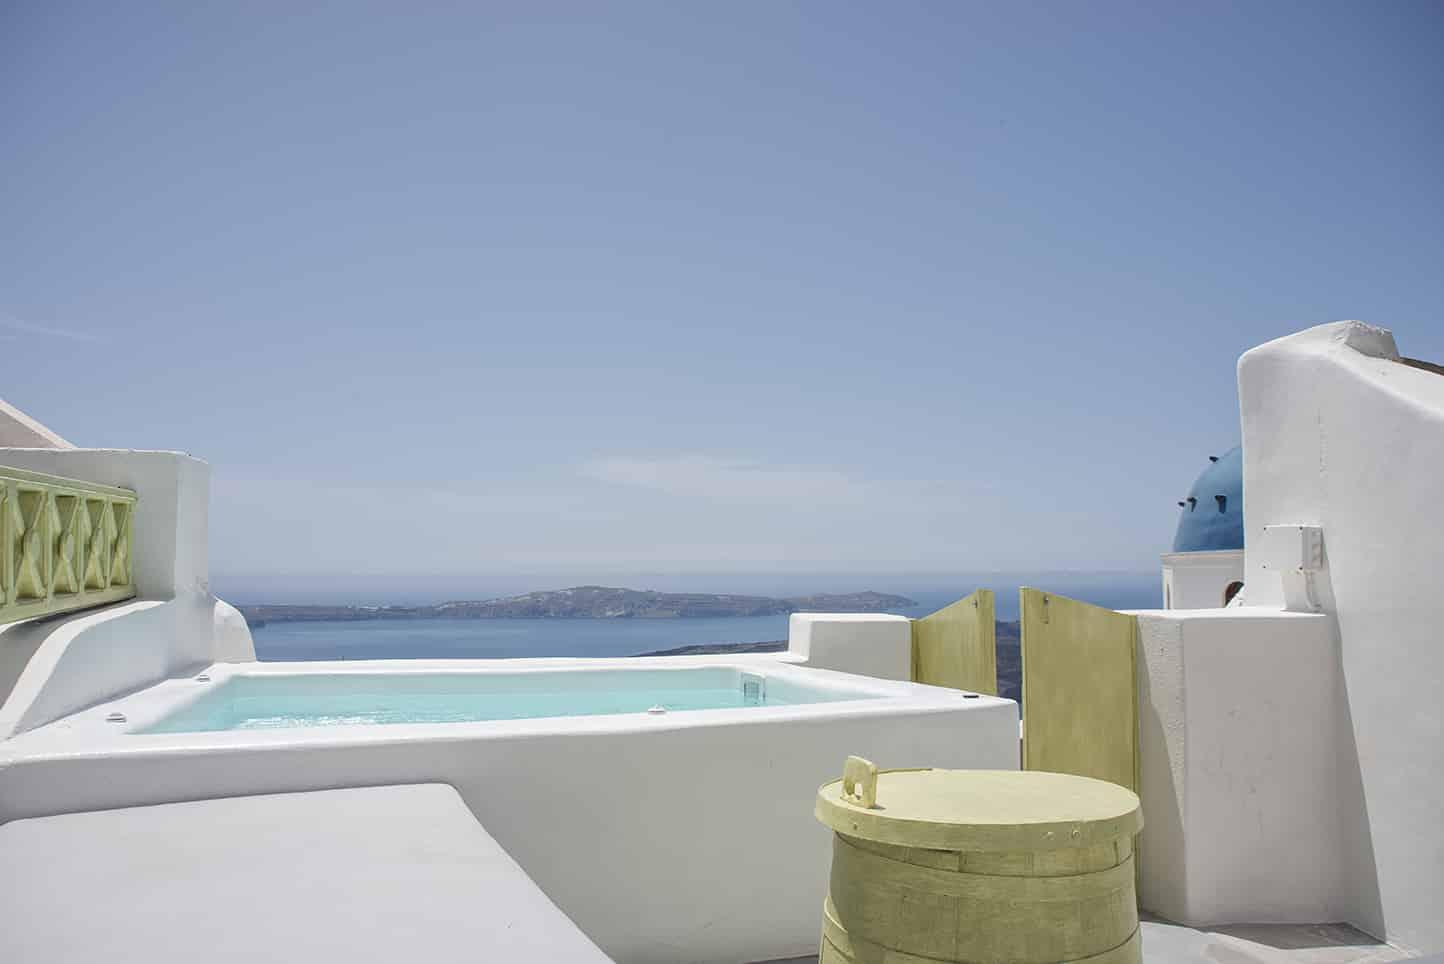 luxury suites jacuzzi santorini view caldera bluedolphins